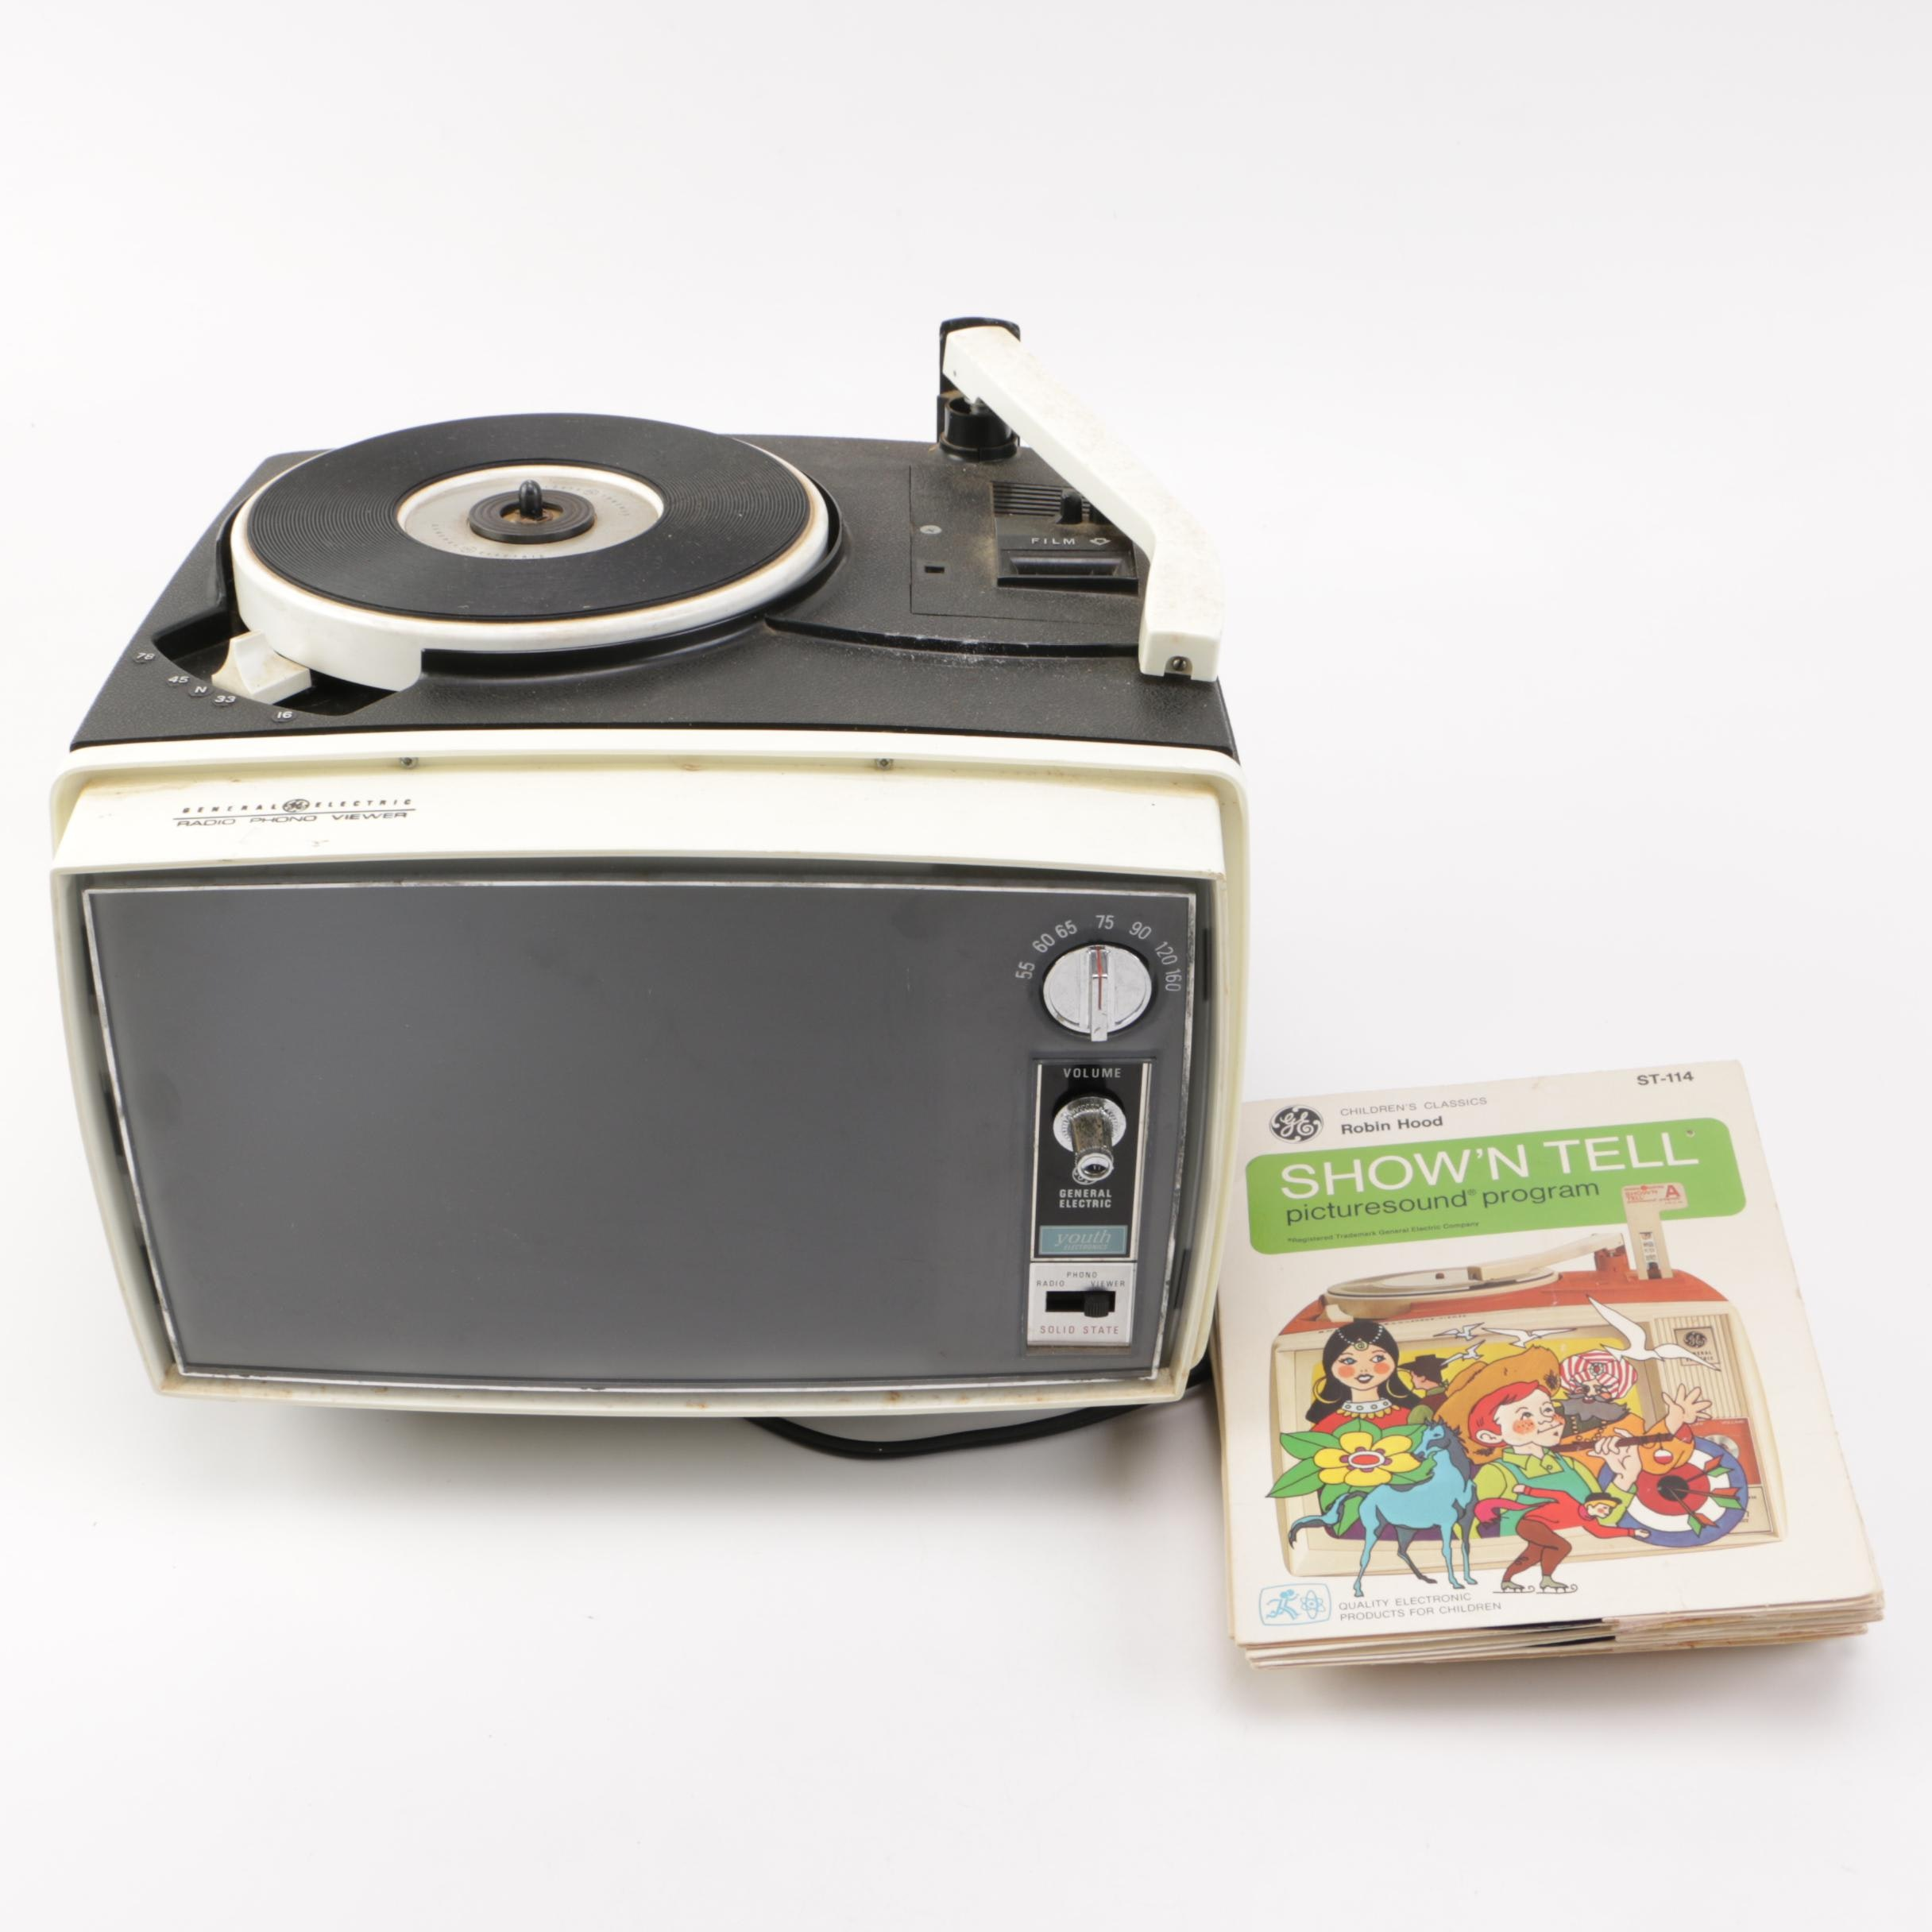 Vintage GE Radio Phono Viewer with Disney Show'N Tell